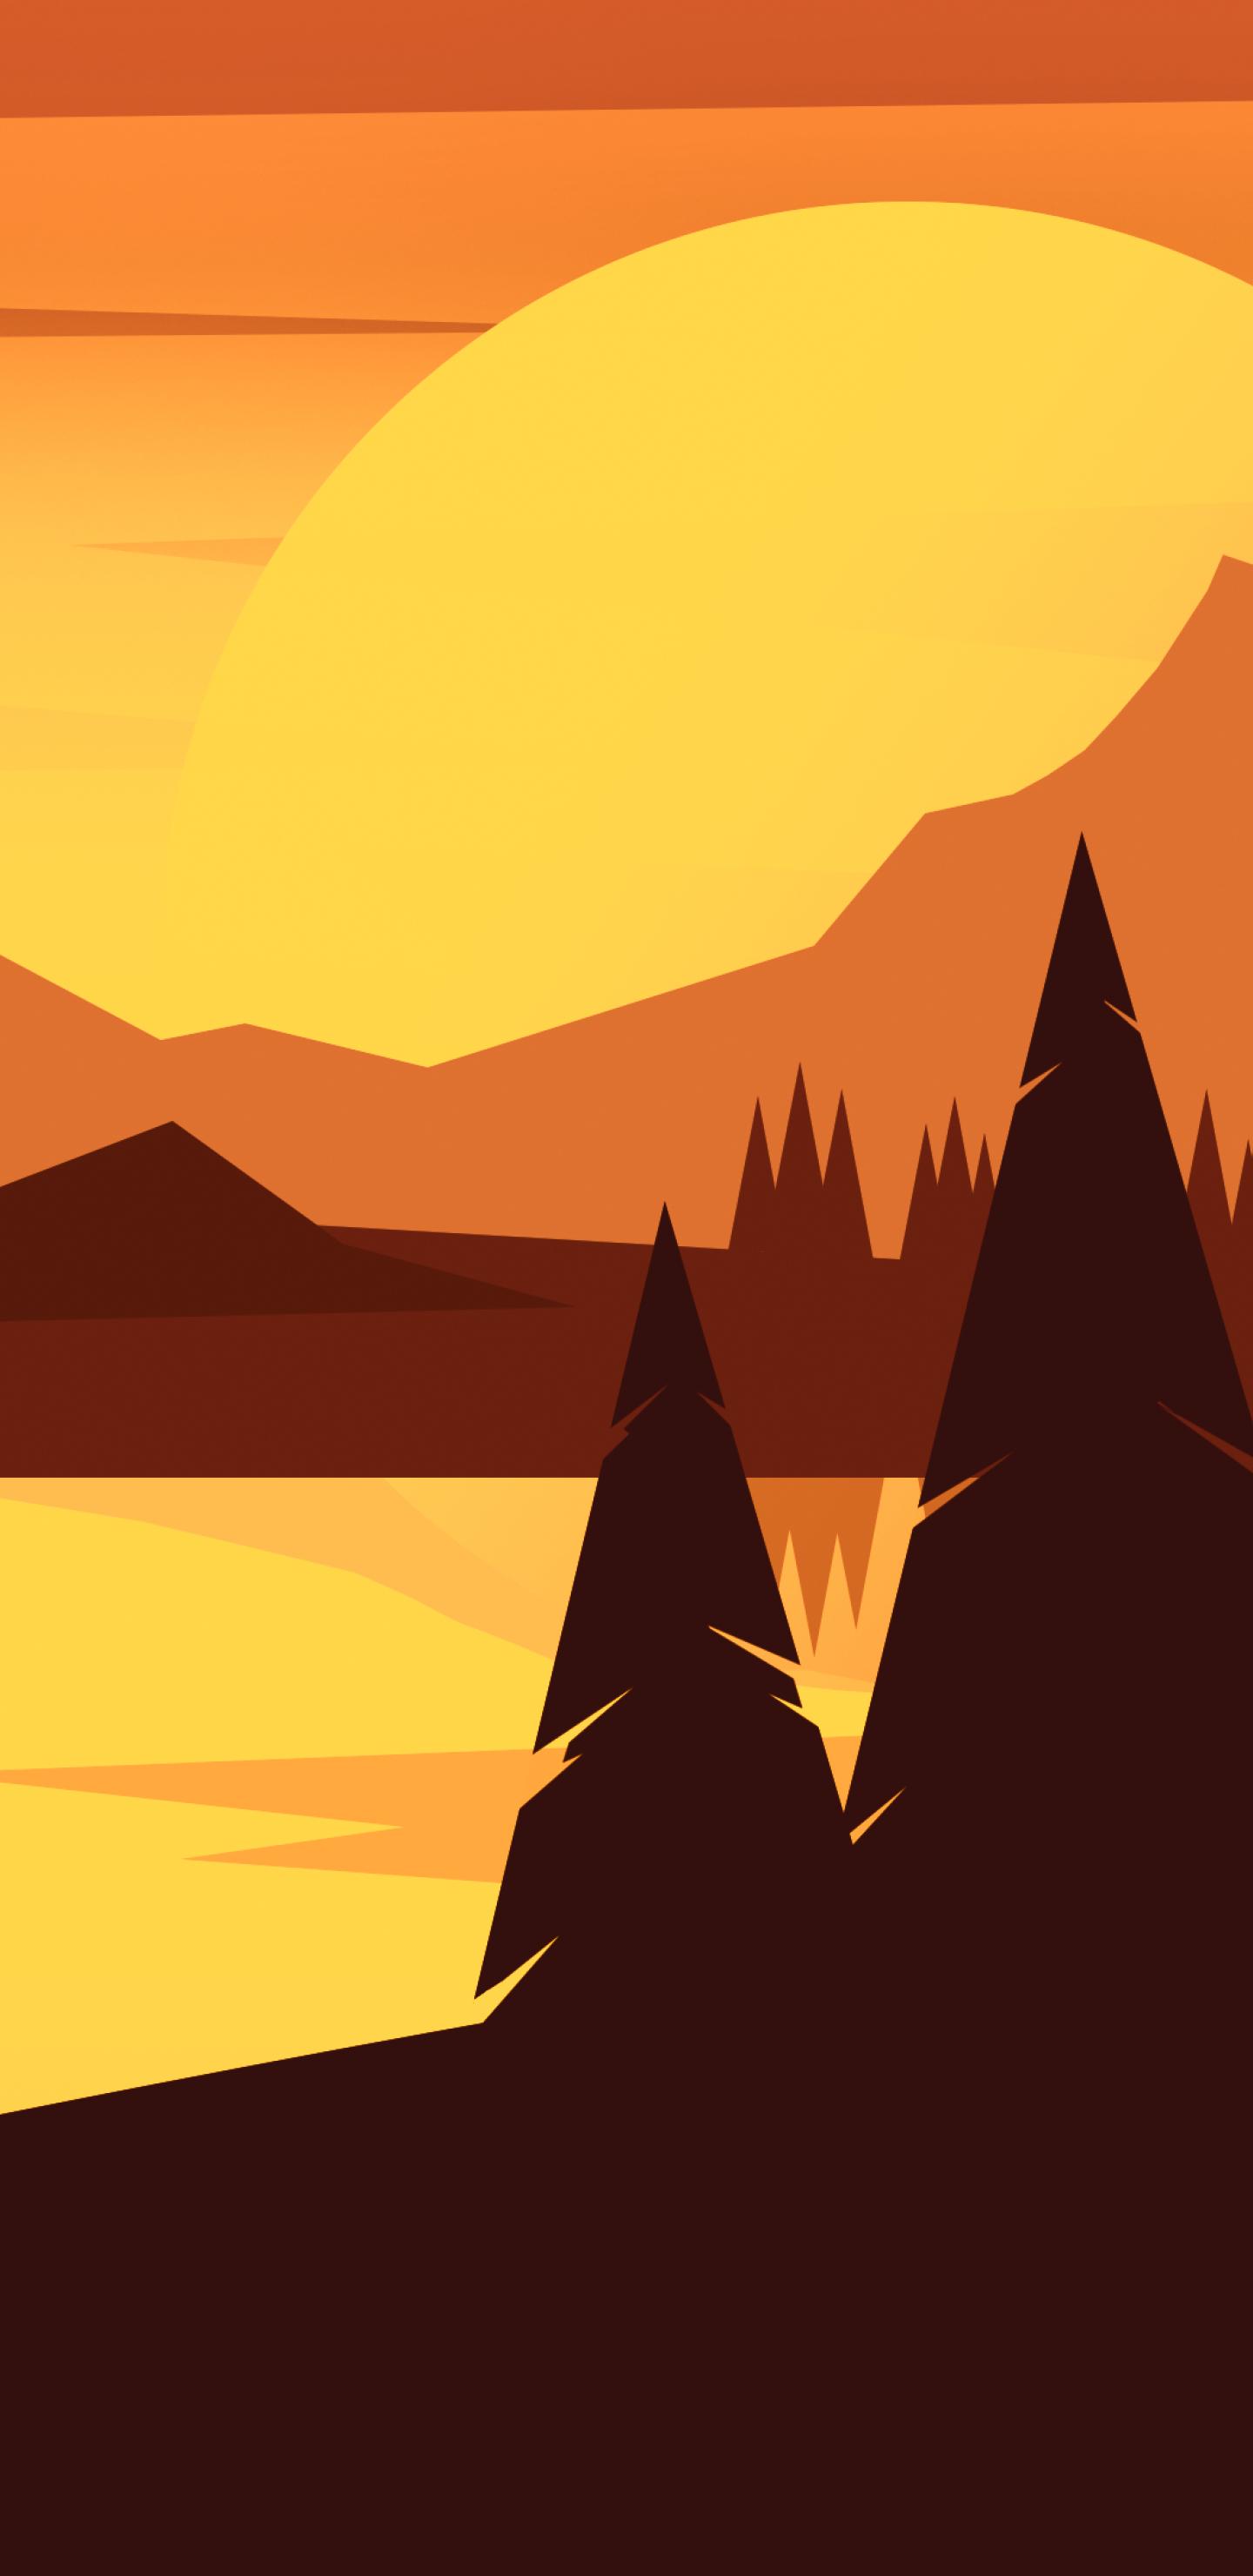 1440x2960 Forest Minimal Mountain Landscape Samsung Galaxy ...